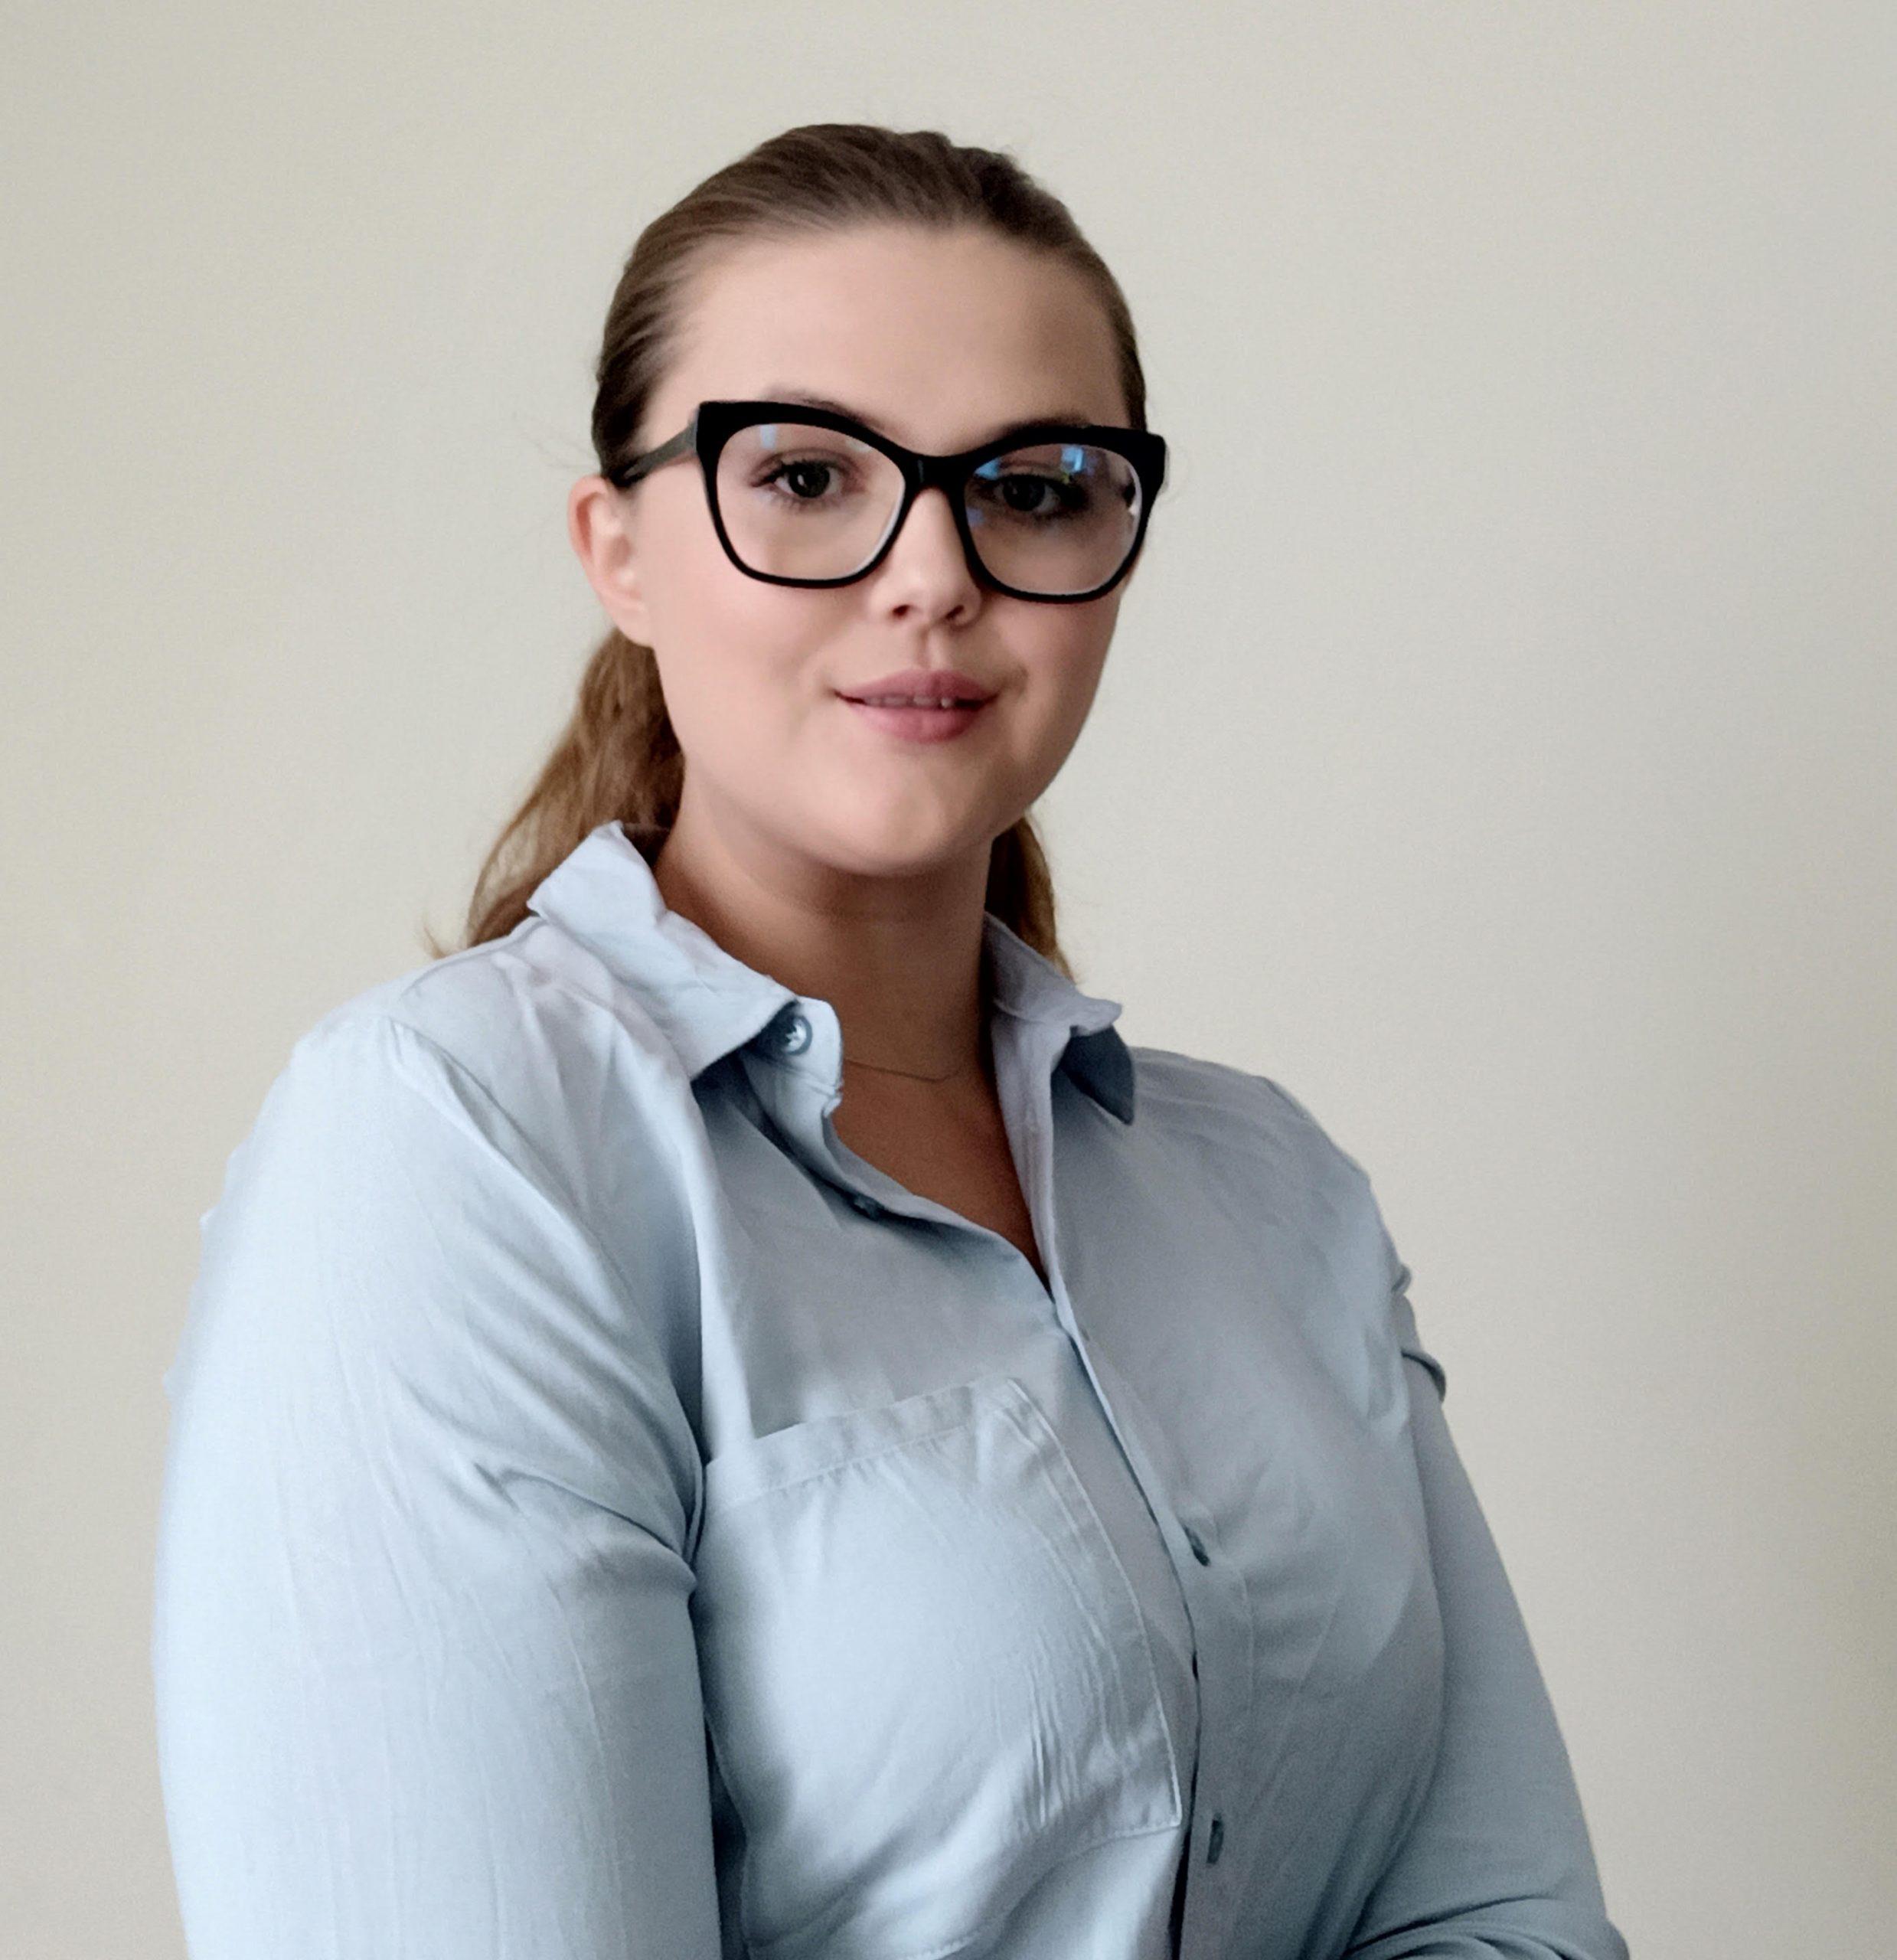 Izabela Łuba